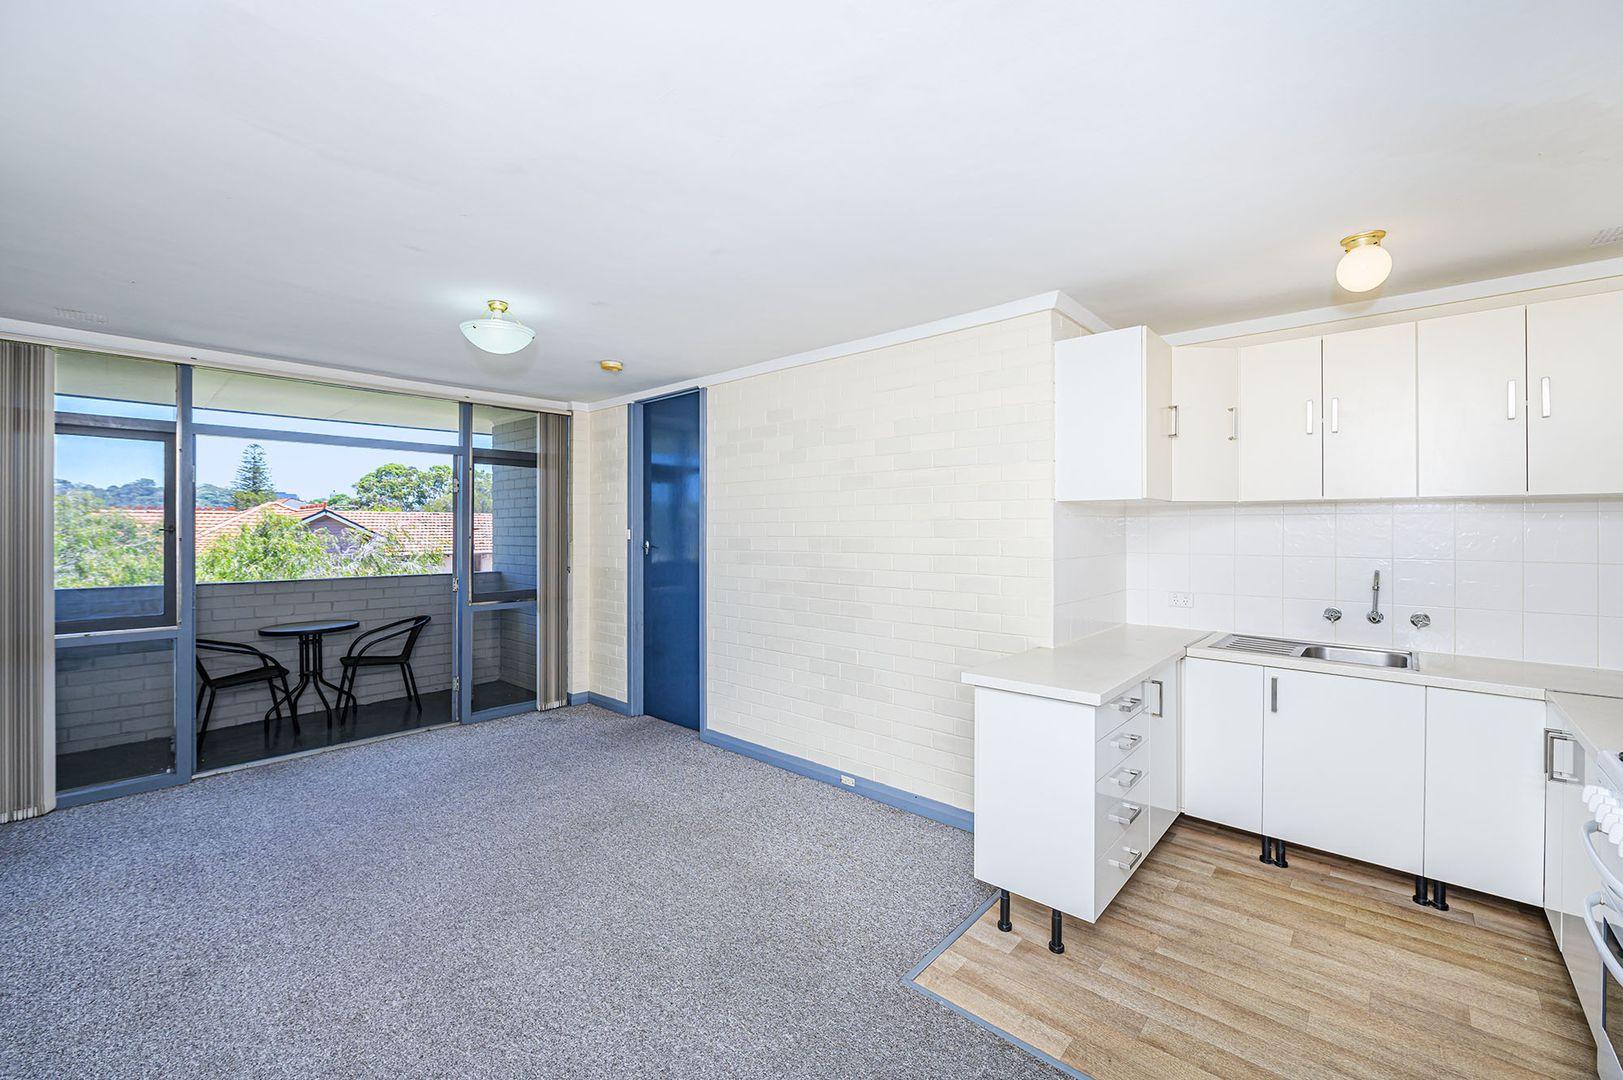 17/54 Melville Pde, South Perth WA 6151, Image 2